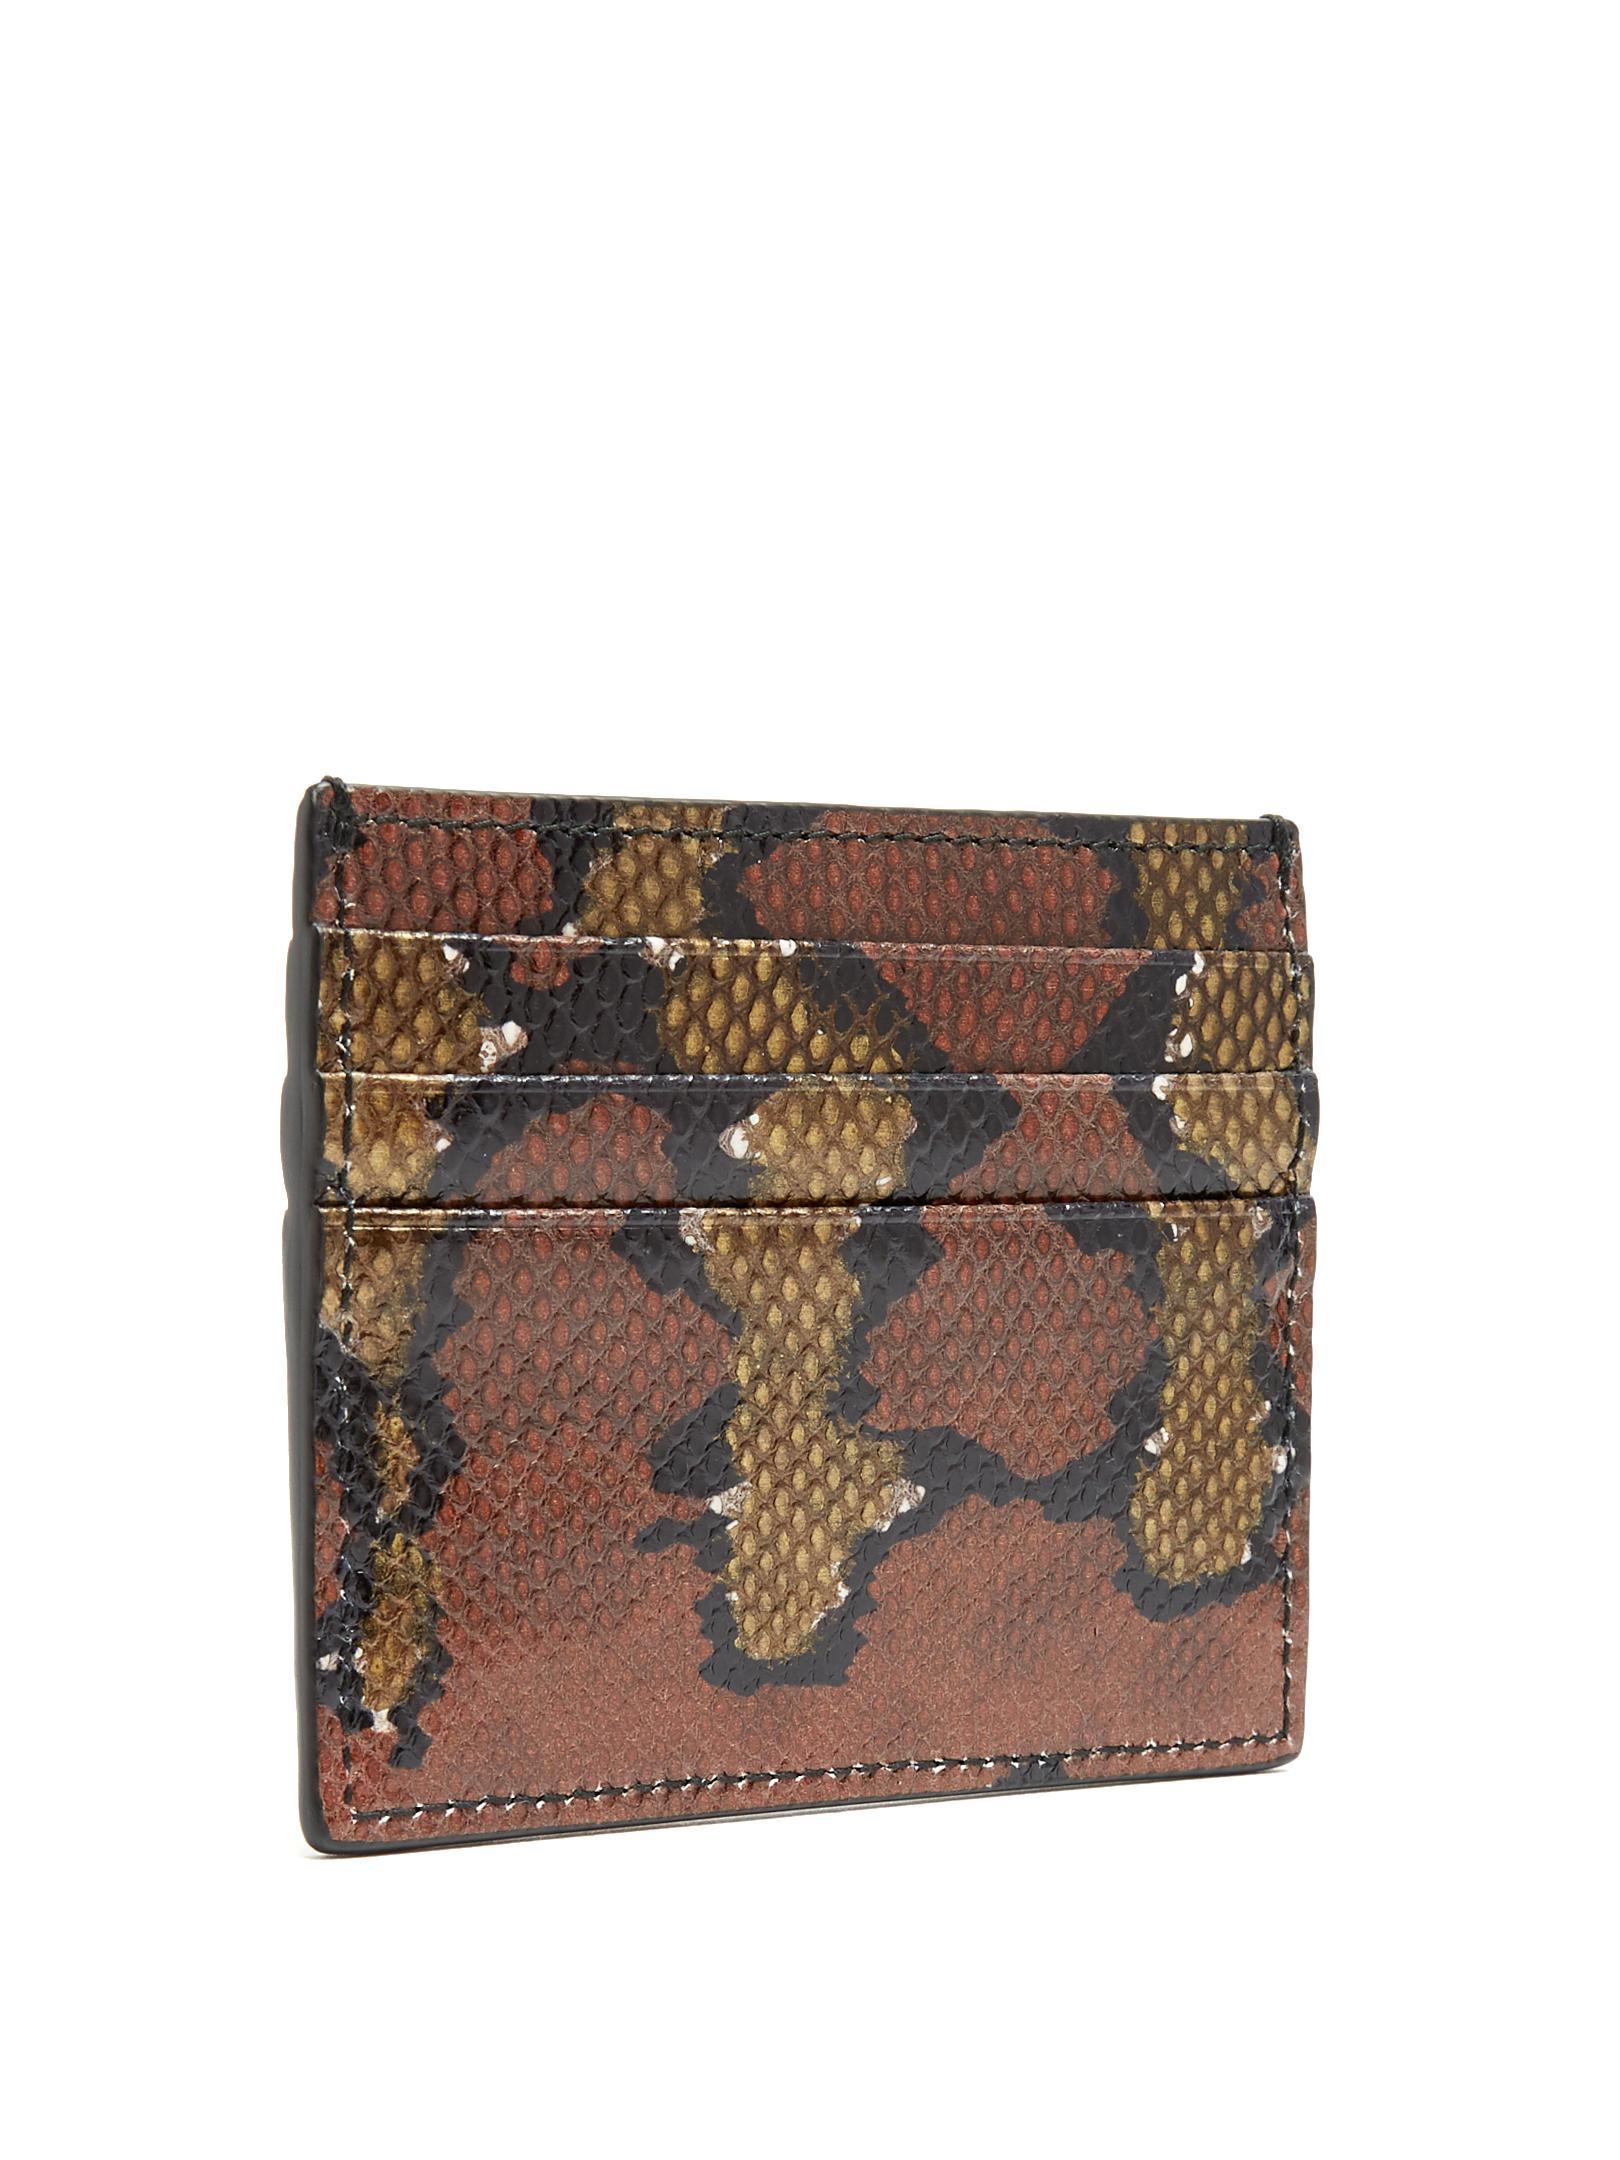 bd419cdd41e391 Bottega Veneta Watersnake Cardholder in Brown - Lyst